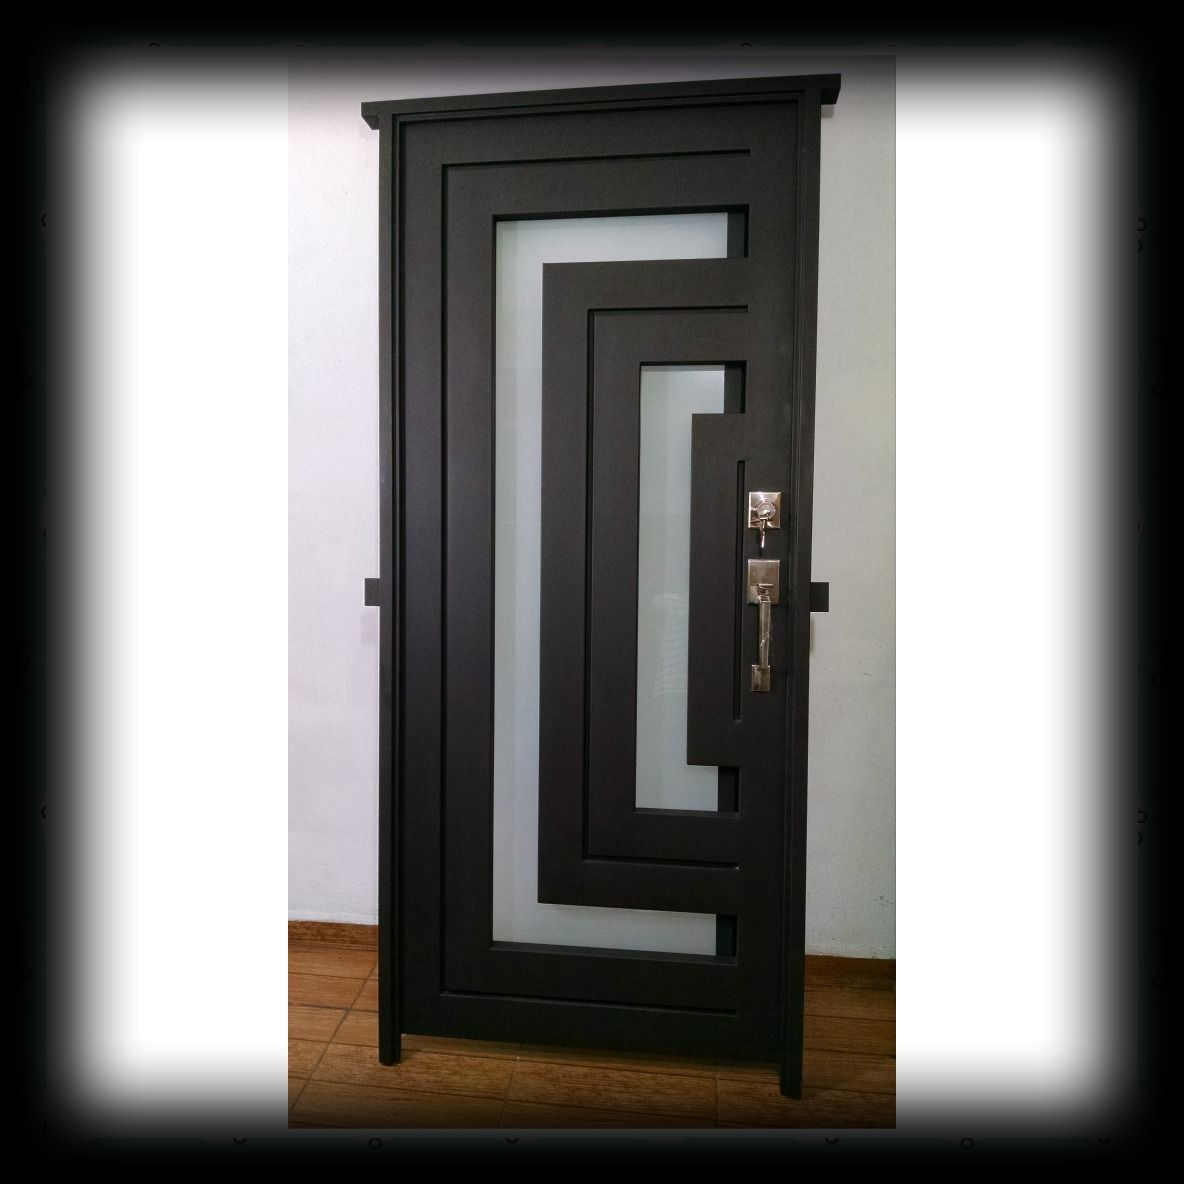 Puertas de forja exterior puertas rejas exterior ue rejas fijas rejas abatibles o incluso rejas - Puertas forja exterior ...